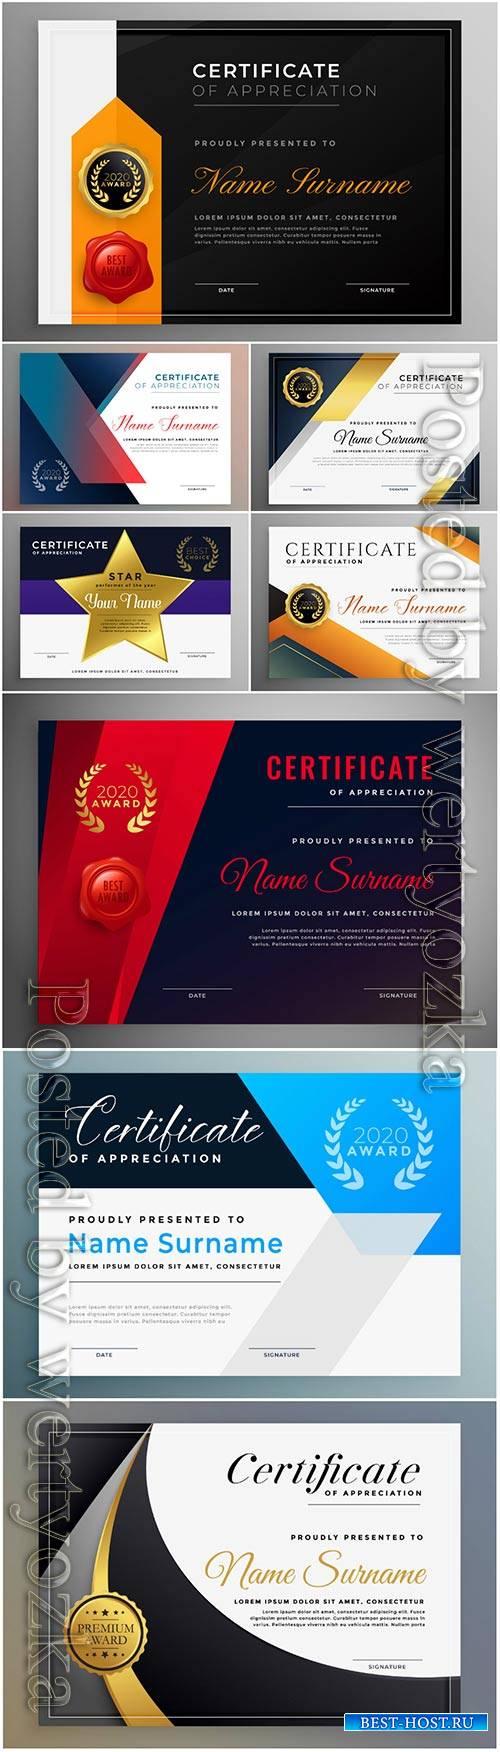 Certificate of appreciation professional vector template